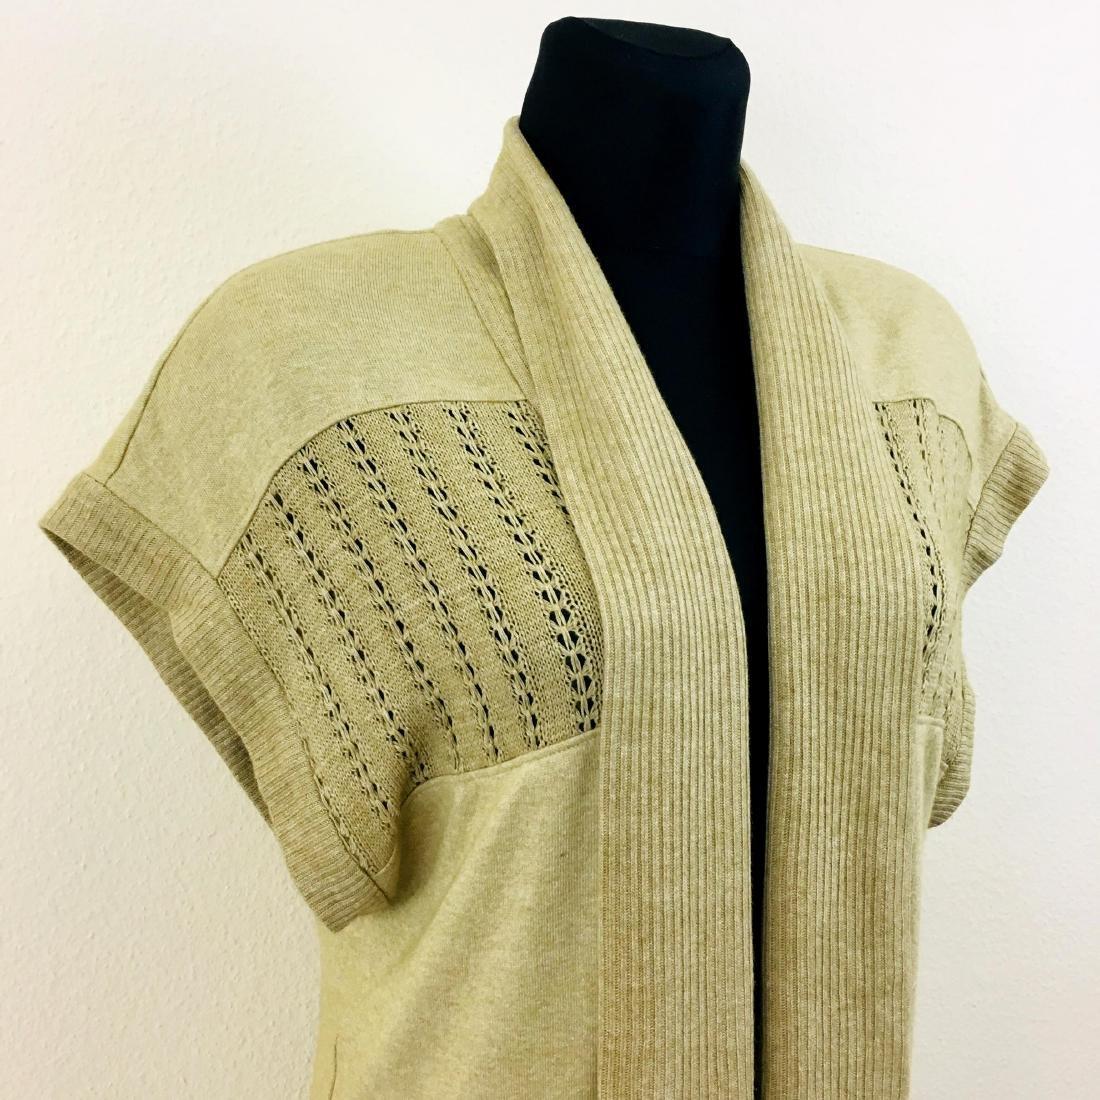 Women's Creation Charmante Wool Blend Cardigan Sweater - 3